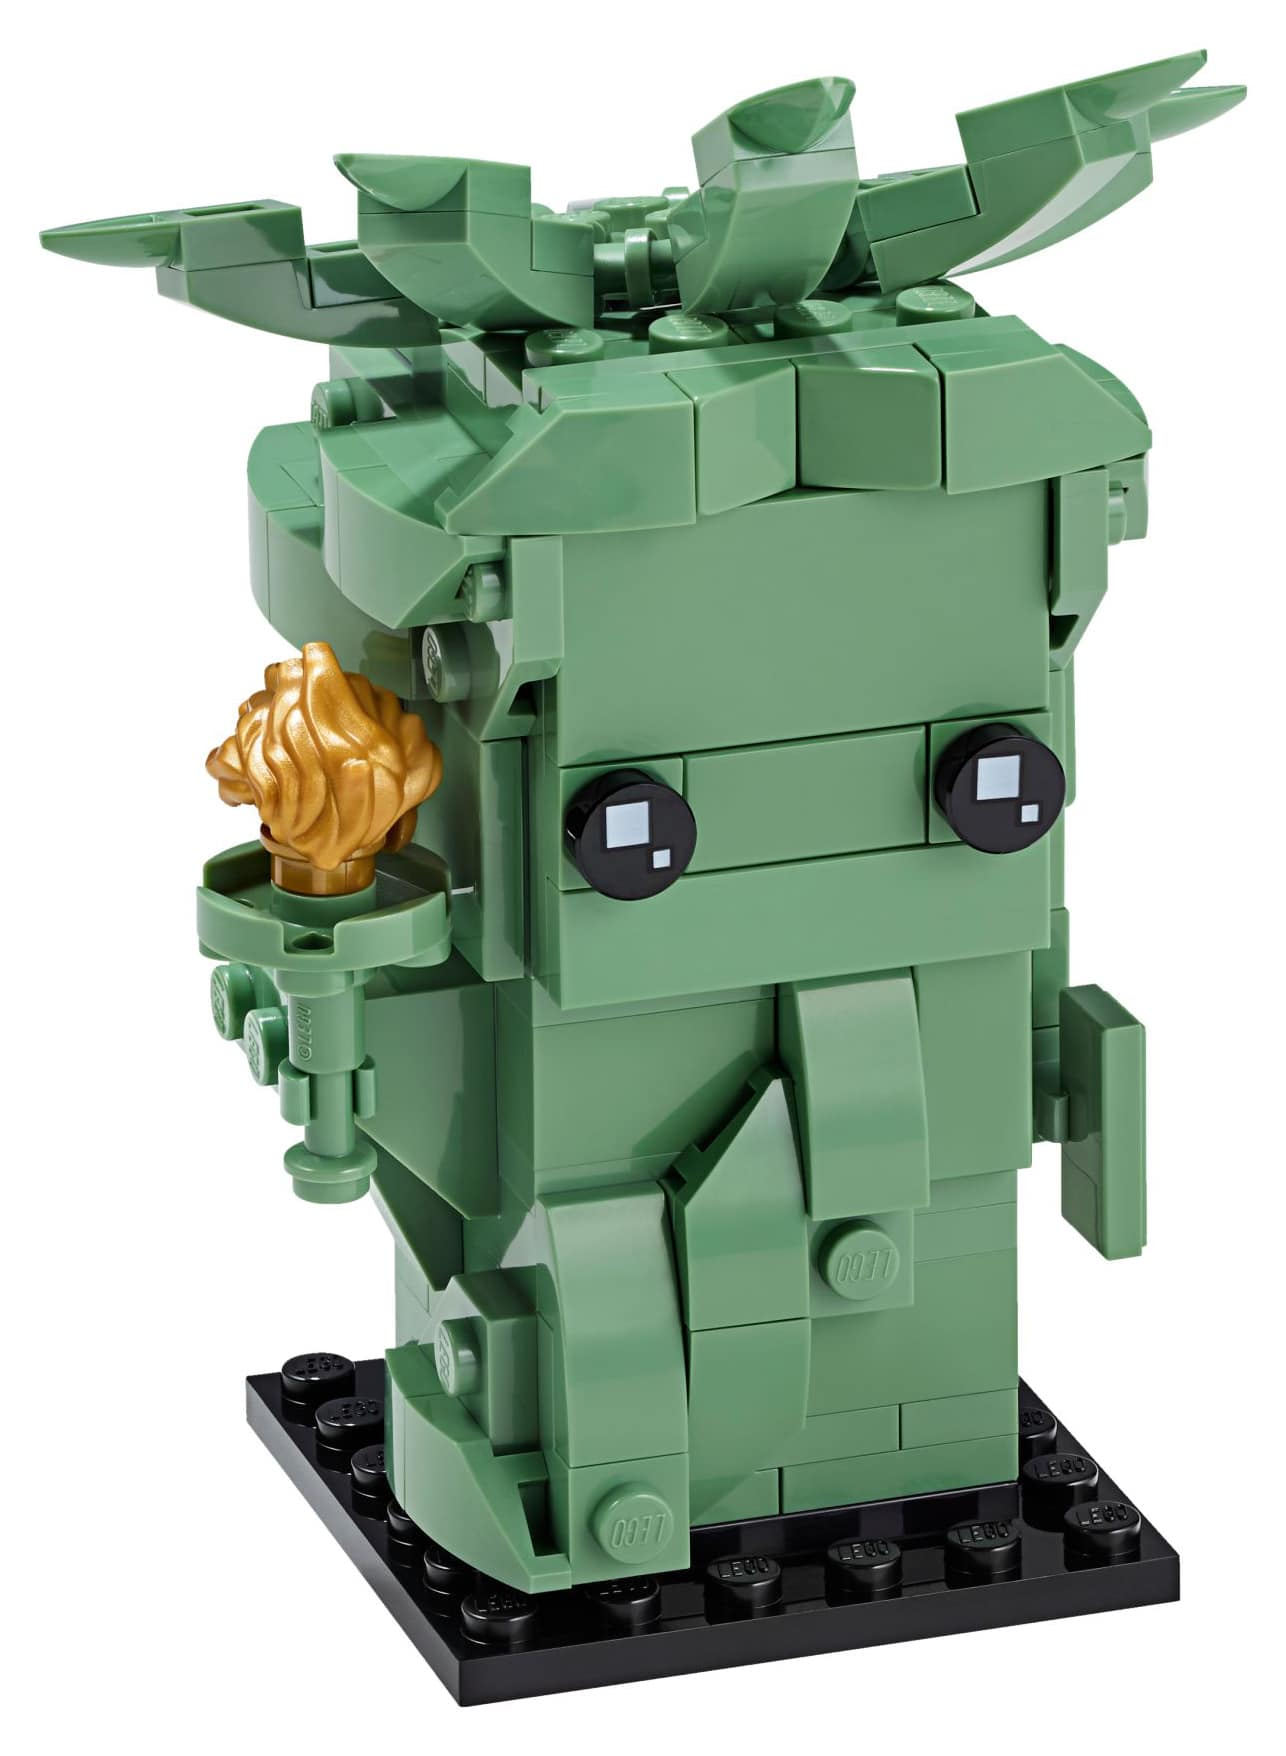 LEGO 40367 Lady Liberty